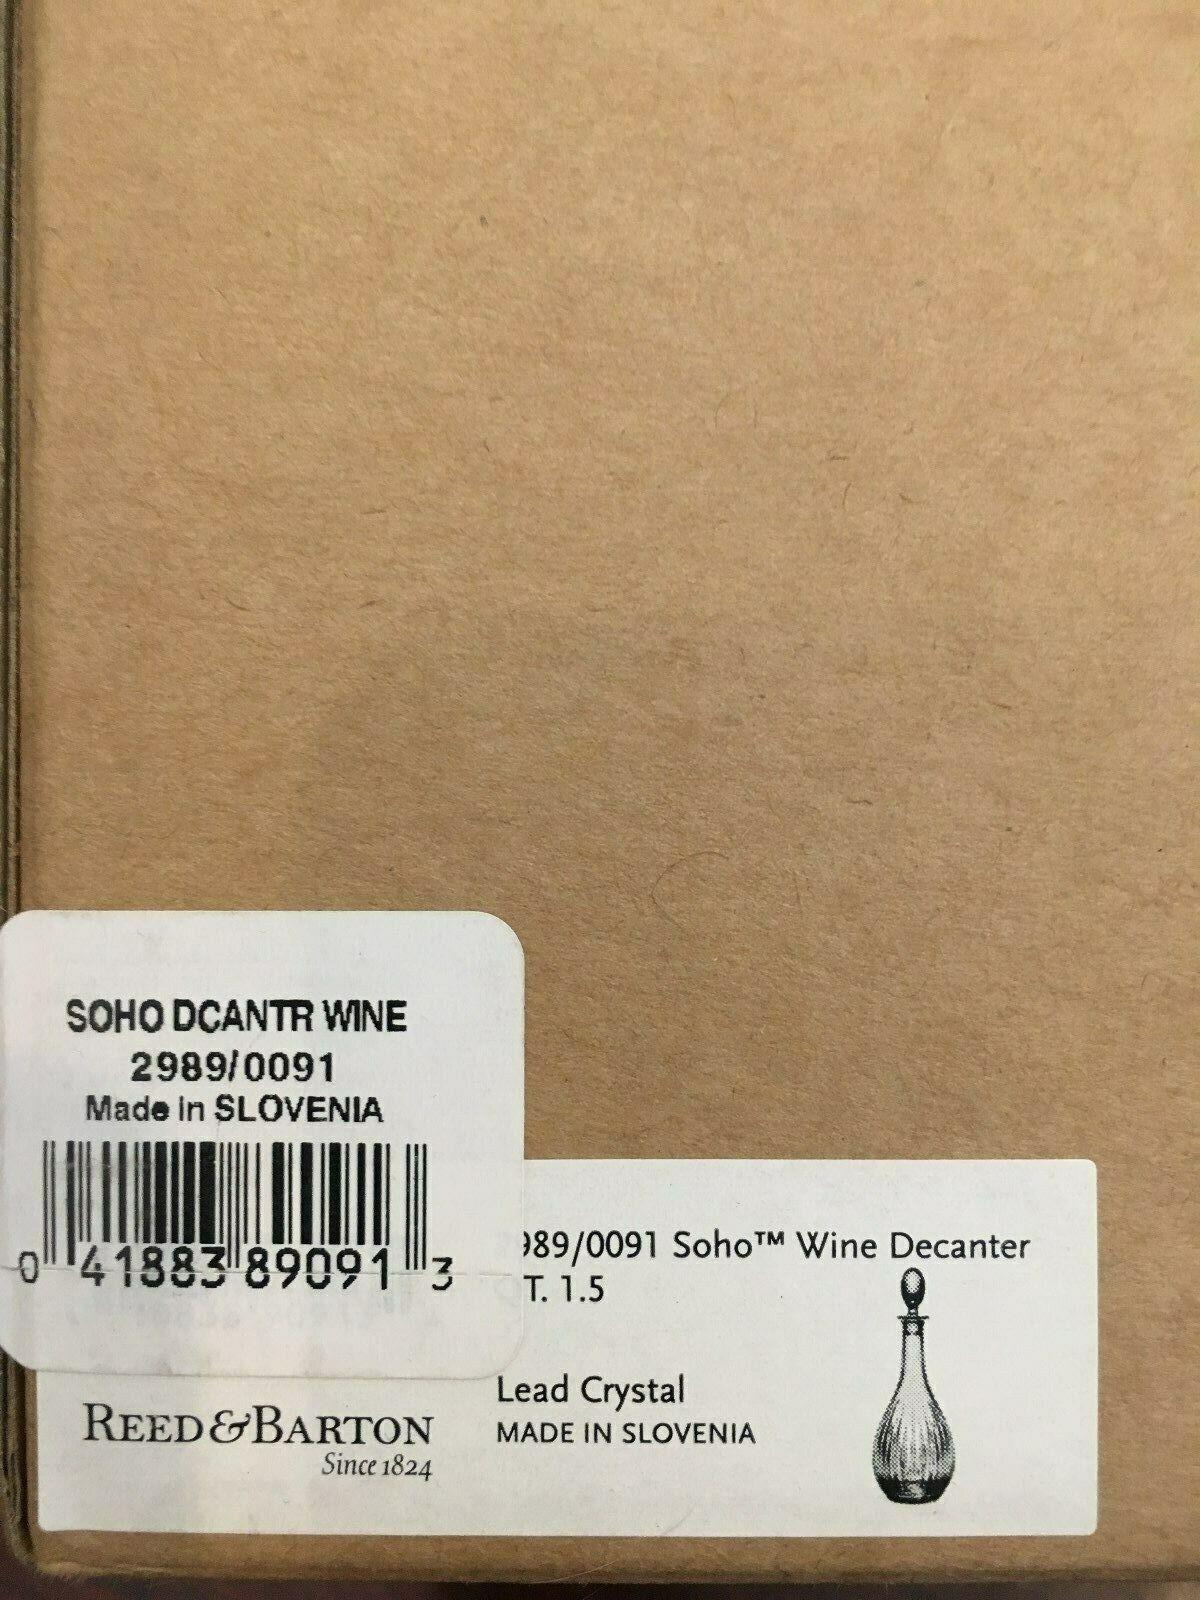 REED & BARTON Shoho vin Decanter cristal de plomb 2989 0091 UPC 041883890913 (Nouveau)